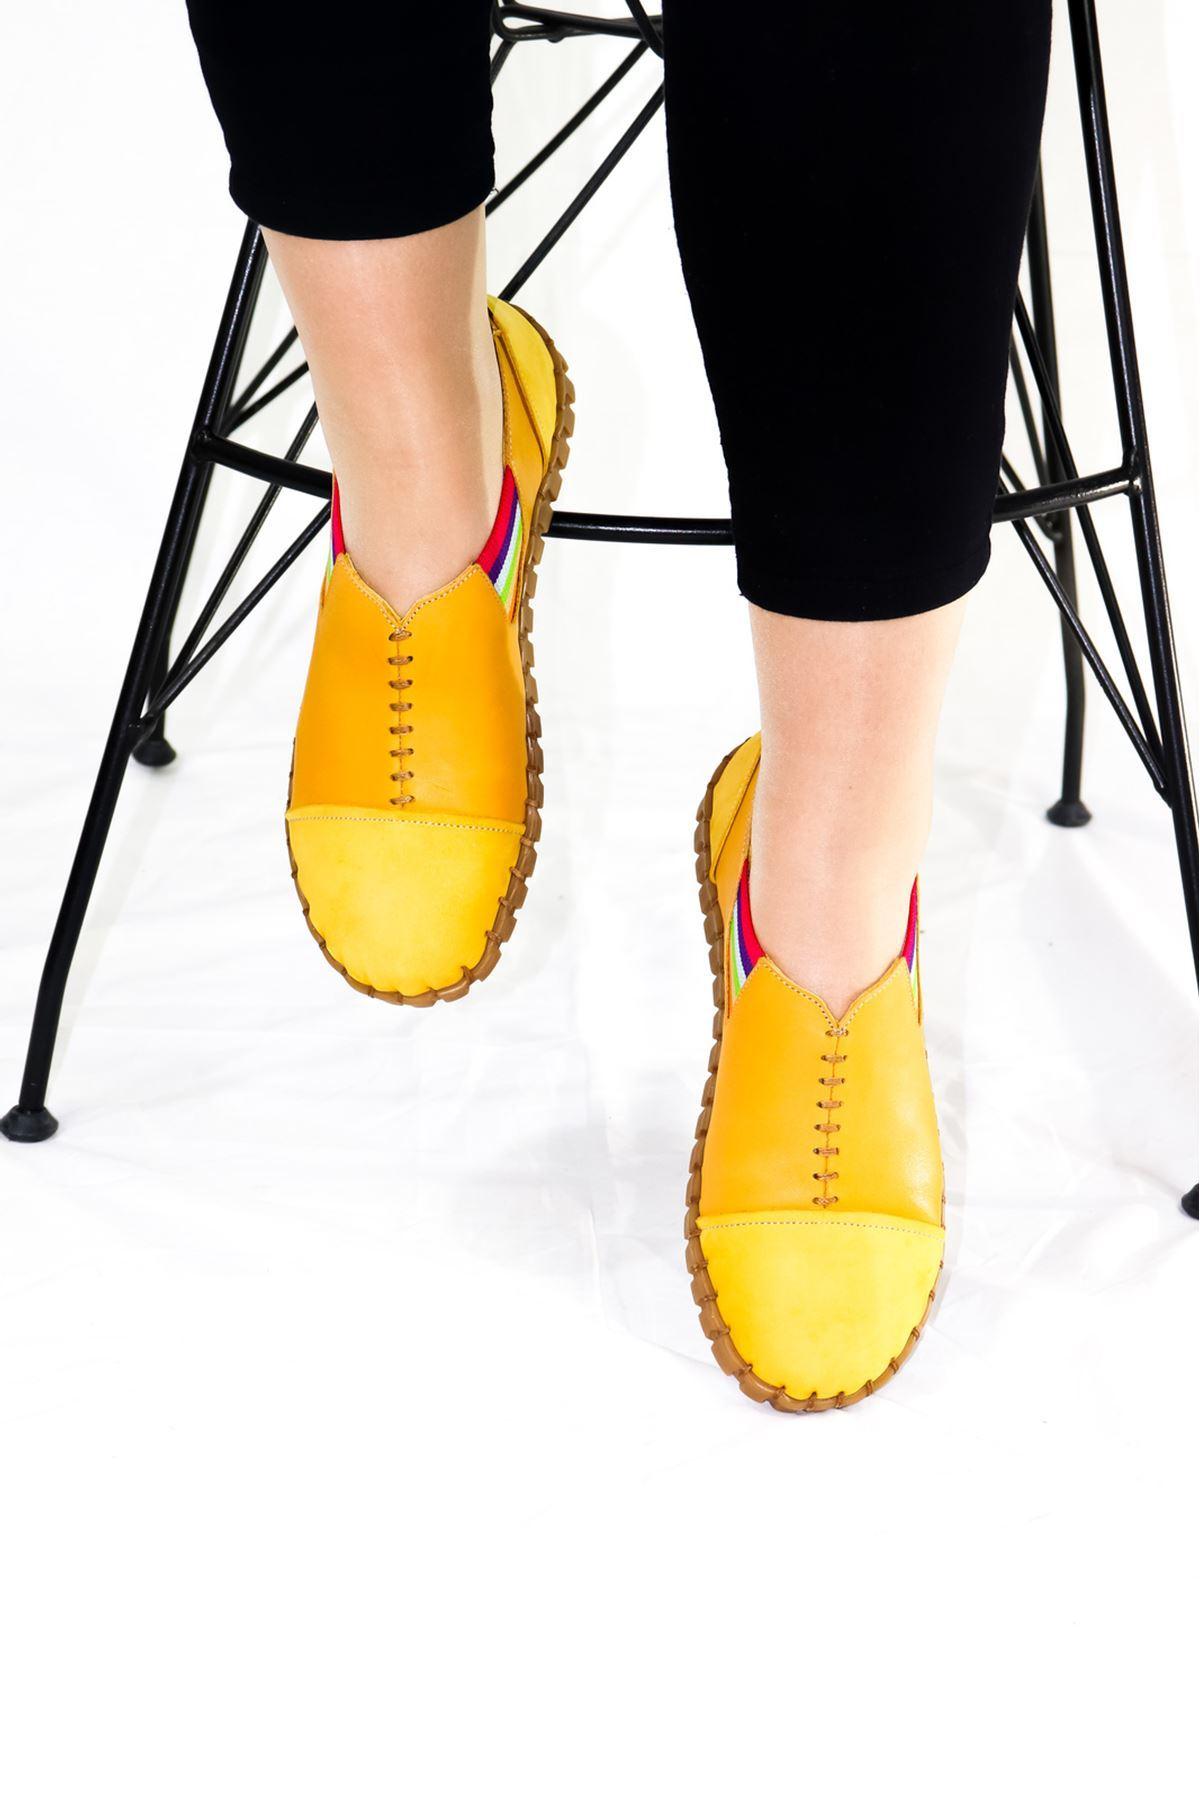 Venüs - 20107034 Sarı Lastikli Kadın Ayakkabısı